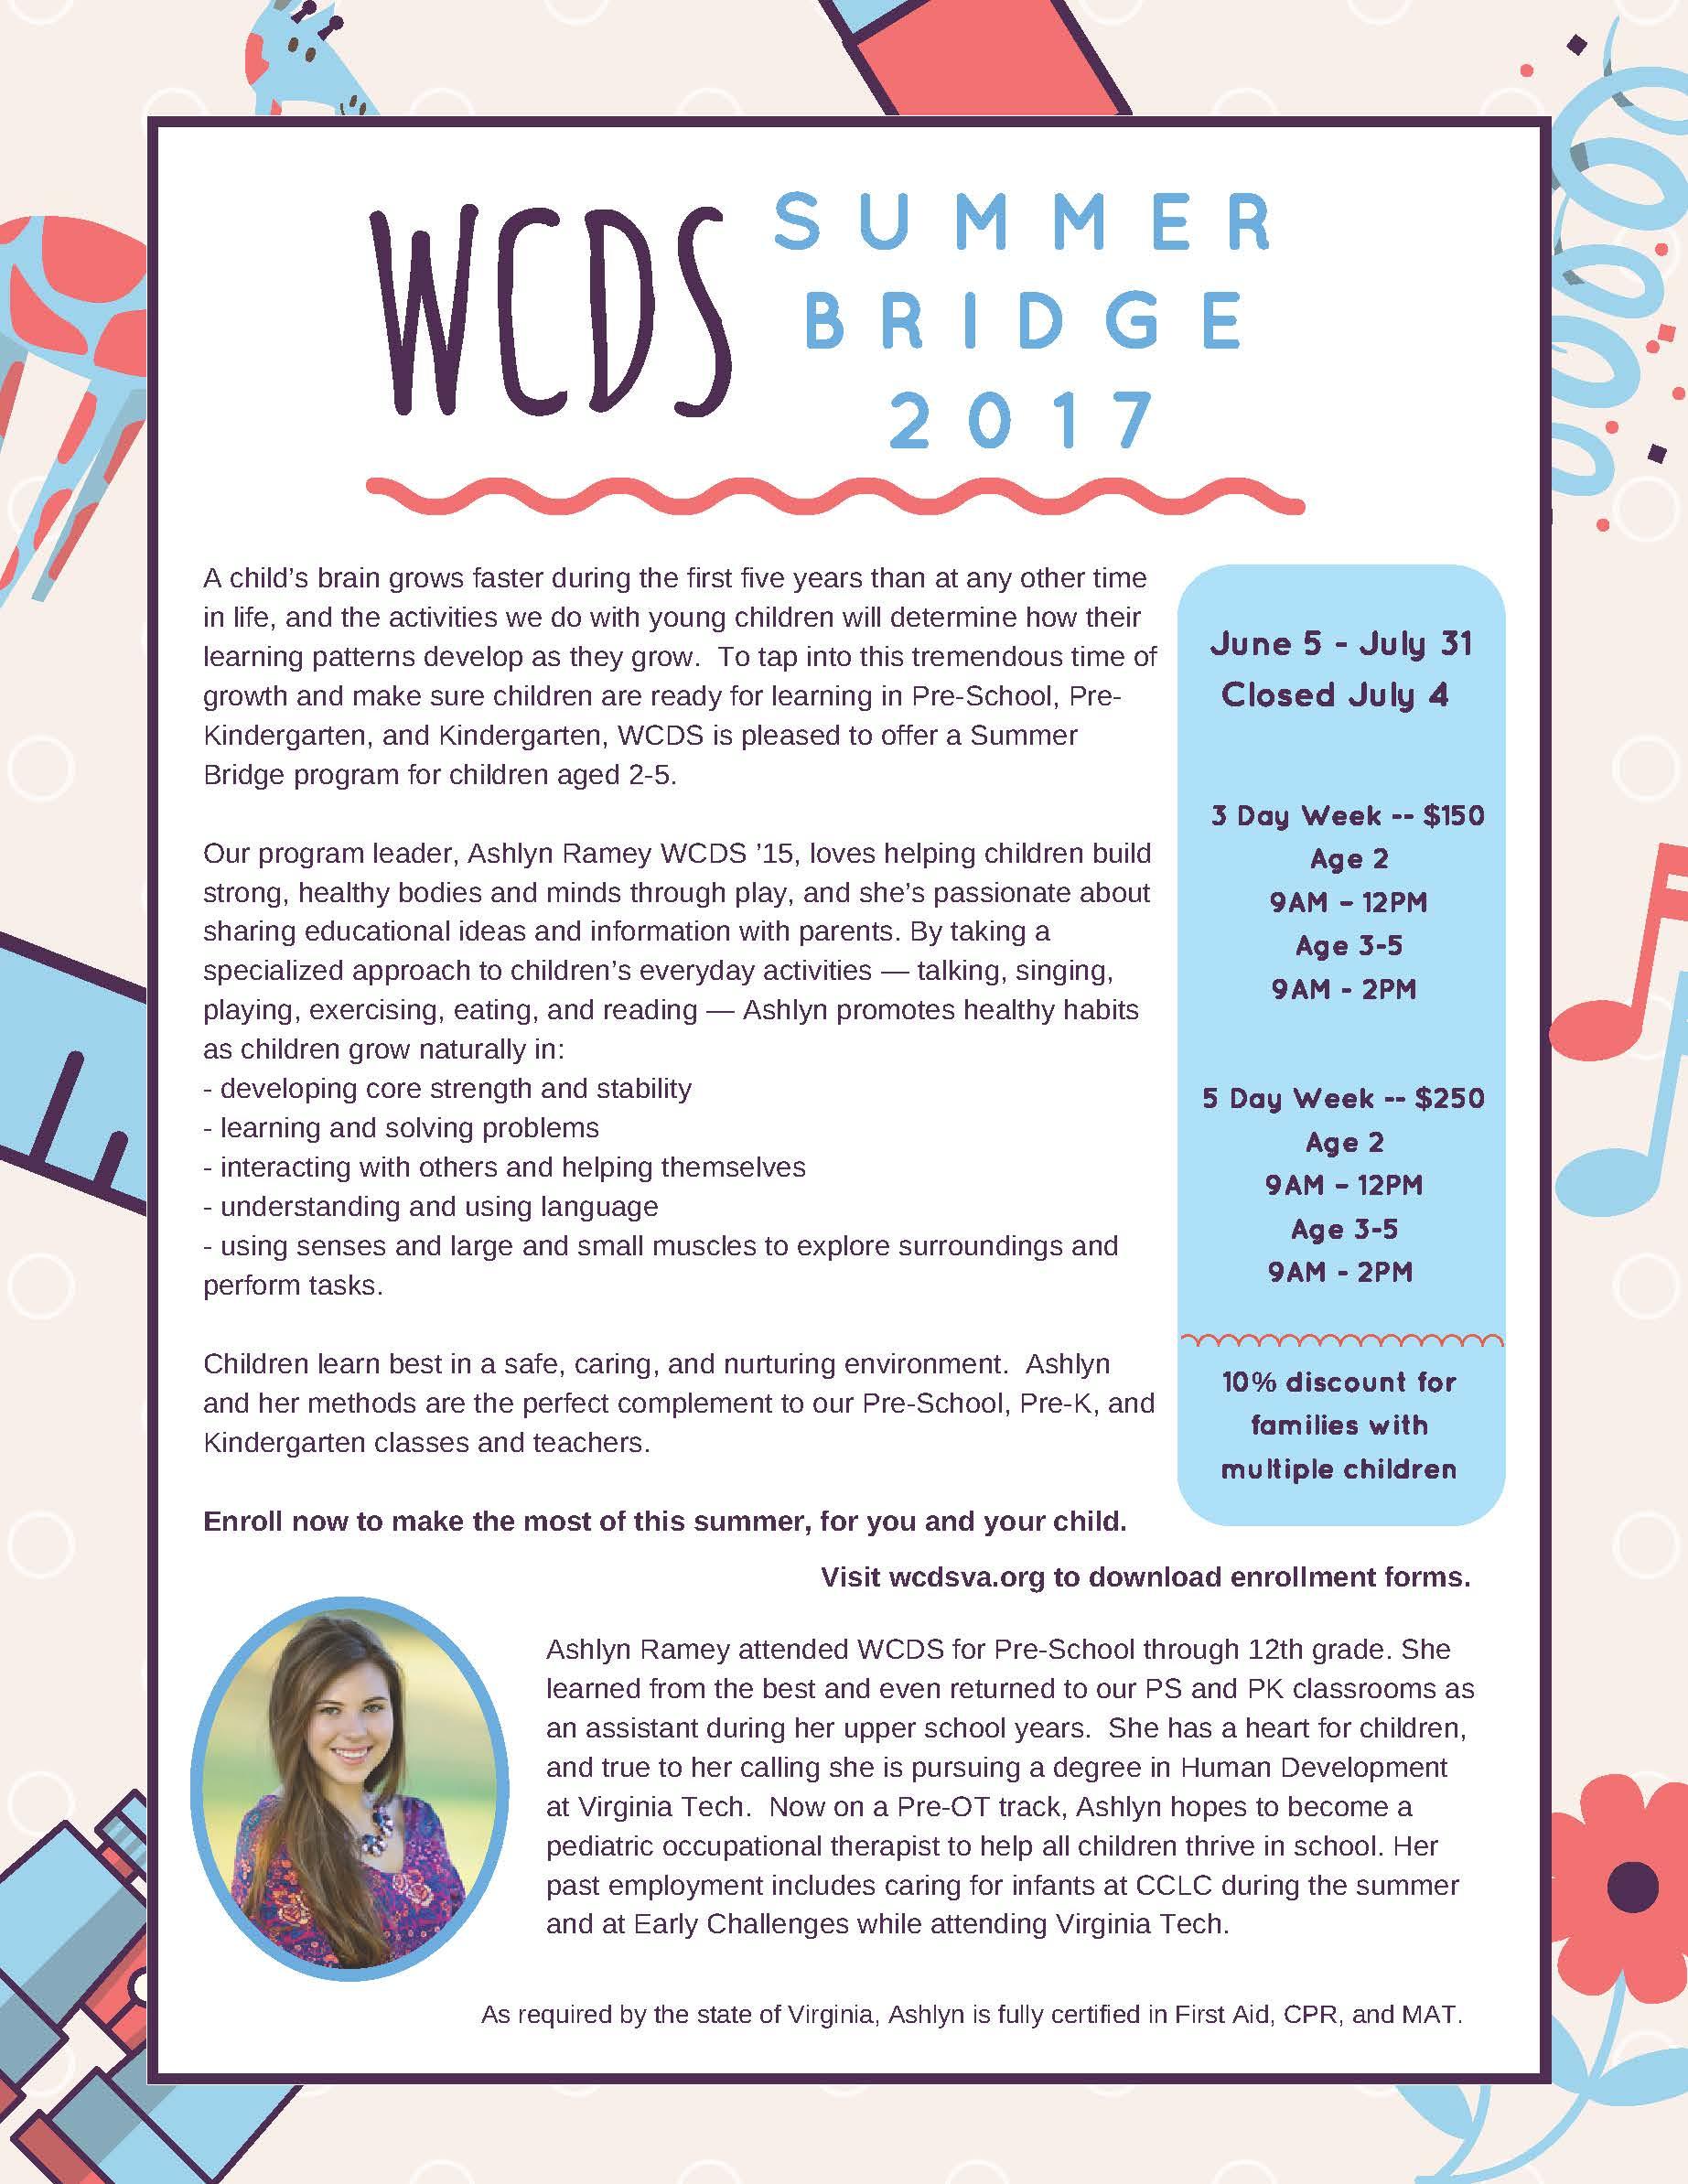 New Summer Bridge 2017